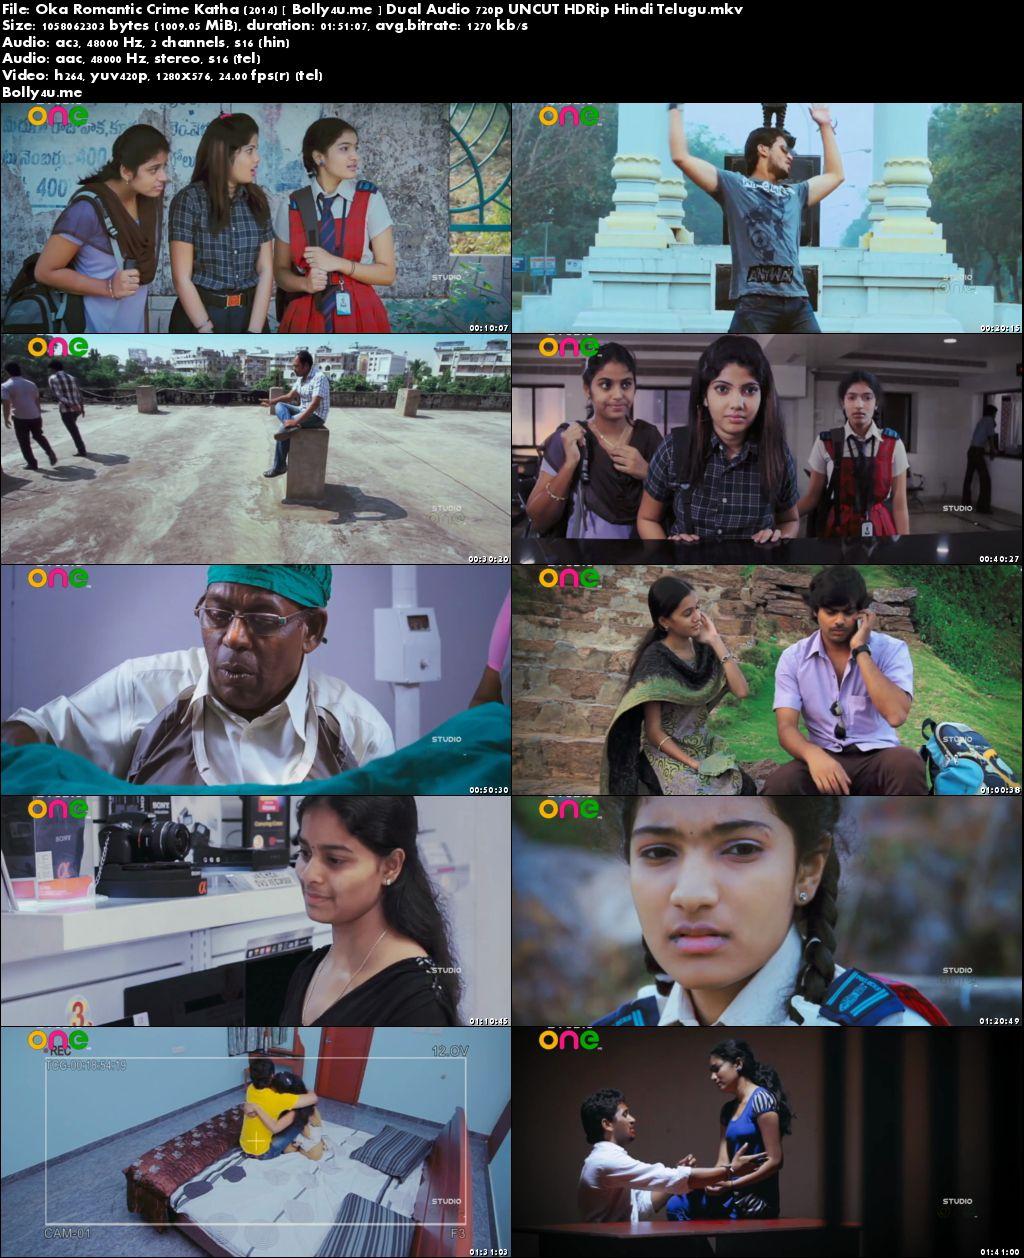 Oka Romantic Crime Katha 2014 HDRip 999MB UNCUT Hindi Dual Audio 720p Download